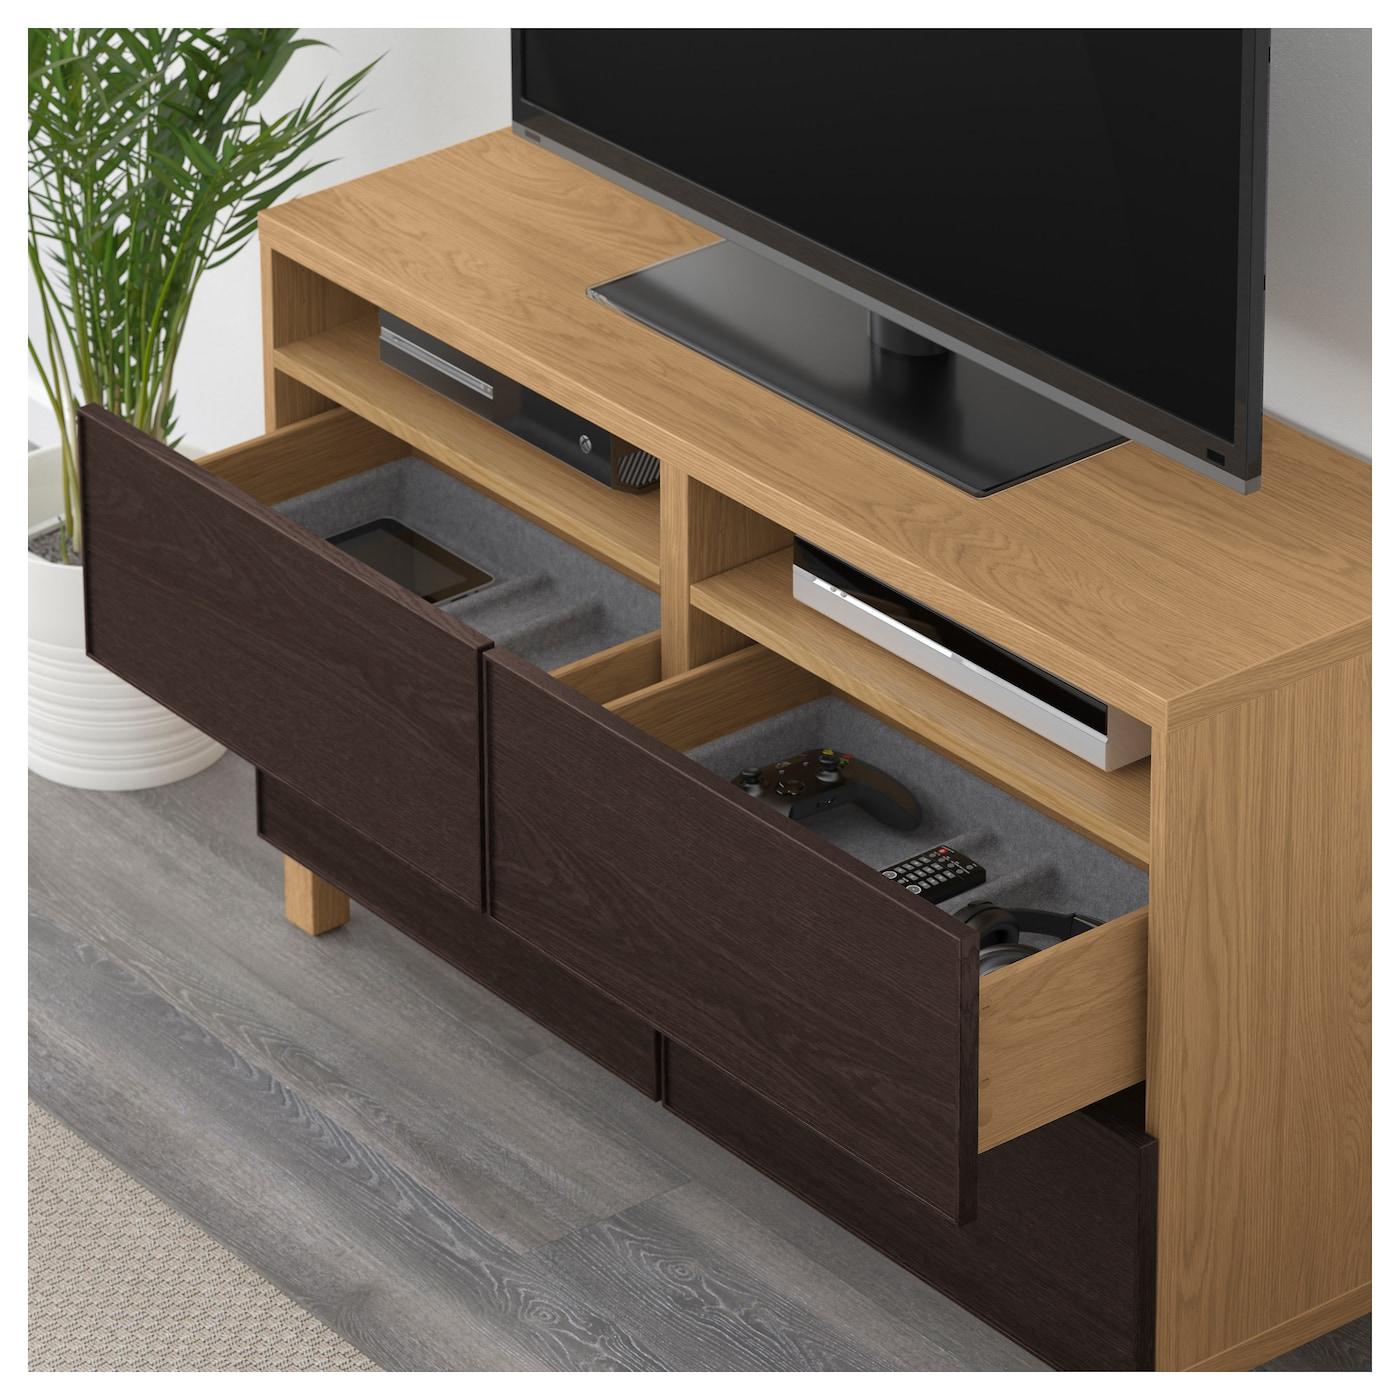 Best Tv Bench With Drawers Oak Effect Inviken Black Brown 120x40x74 Cm Ikea